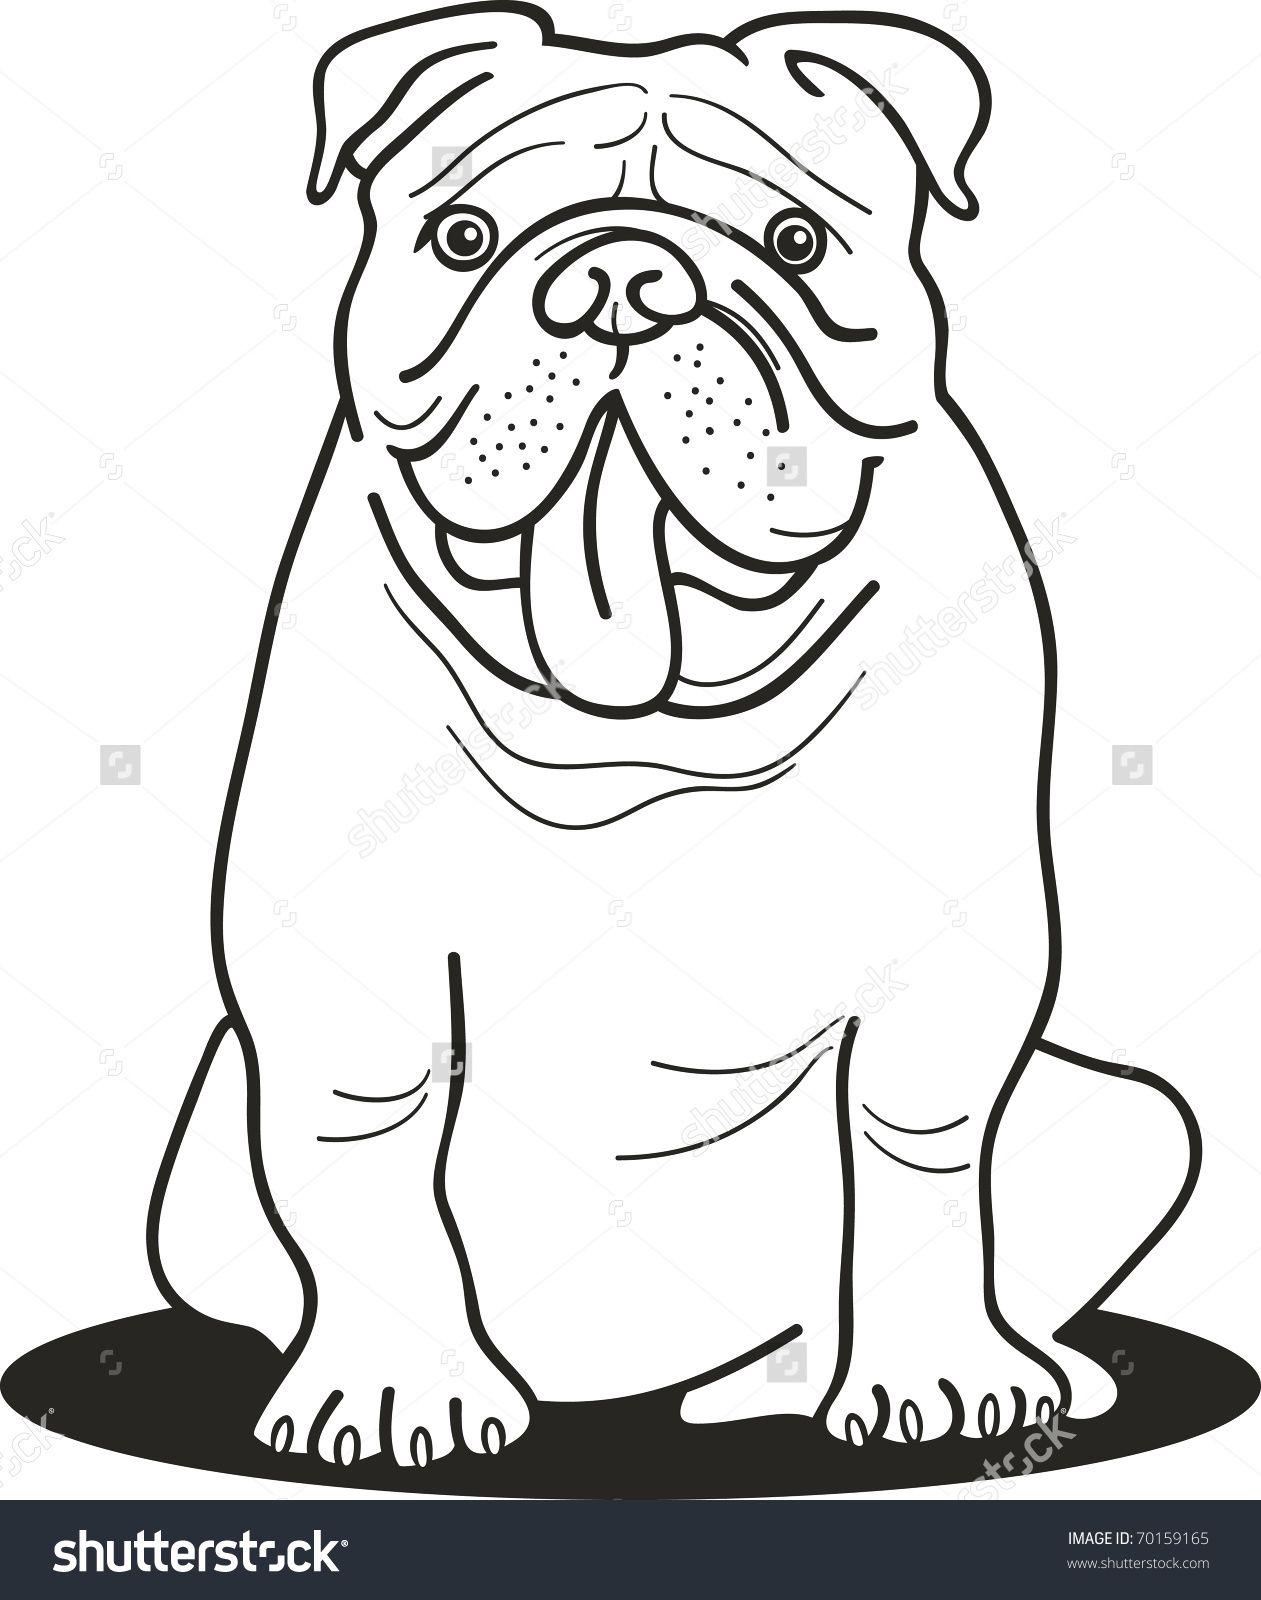 stockvectorillustrationofbulldogforcoloringbook